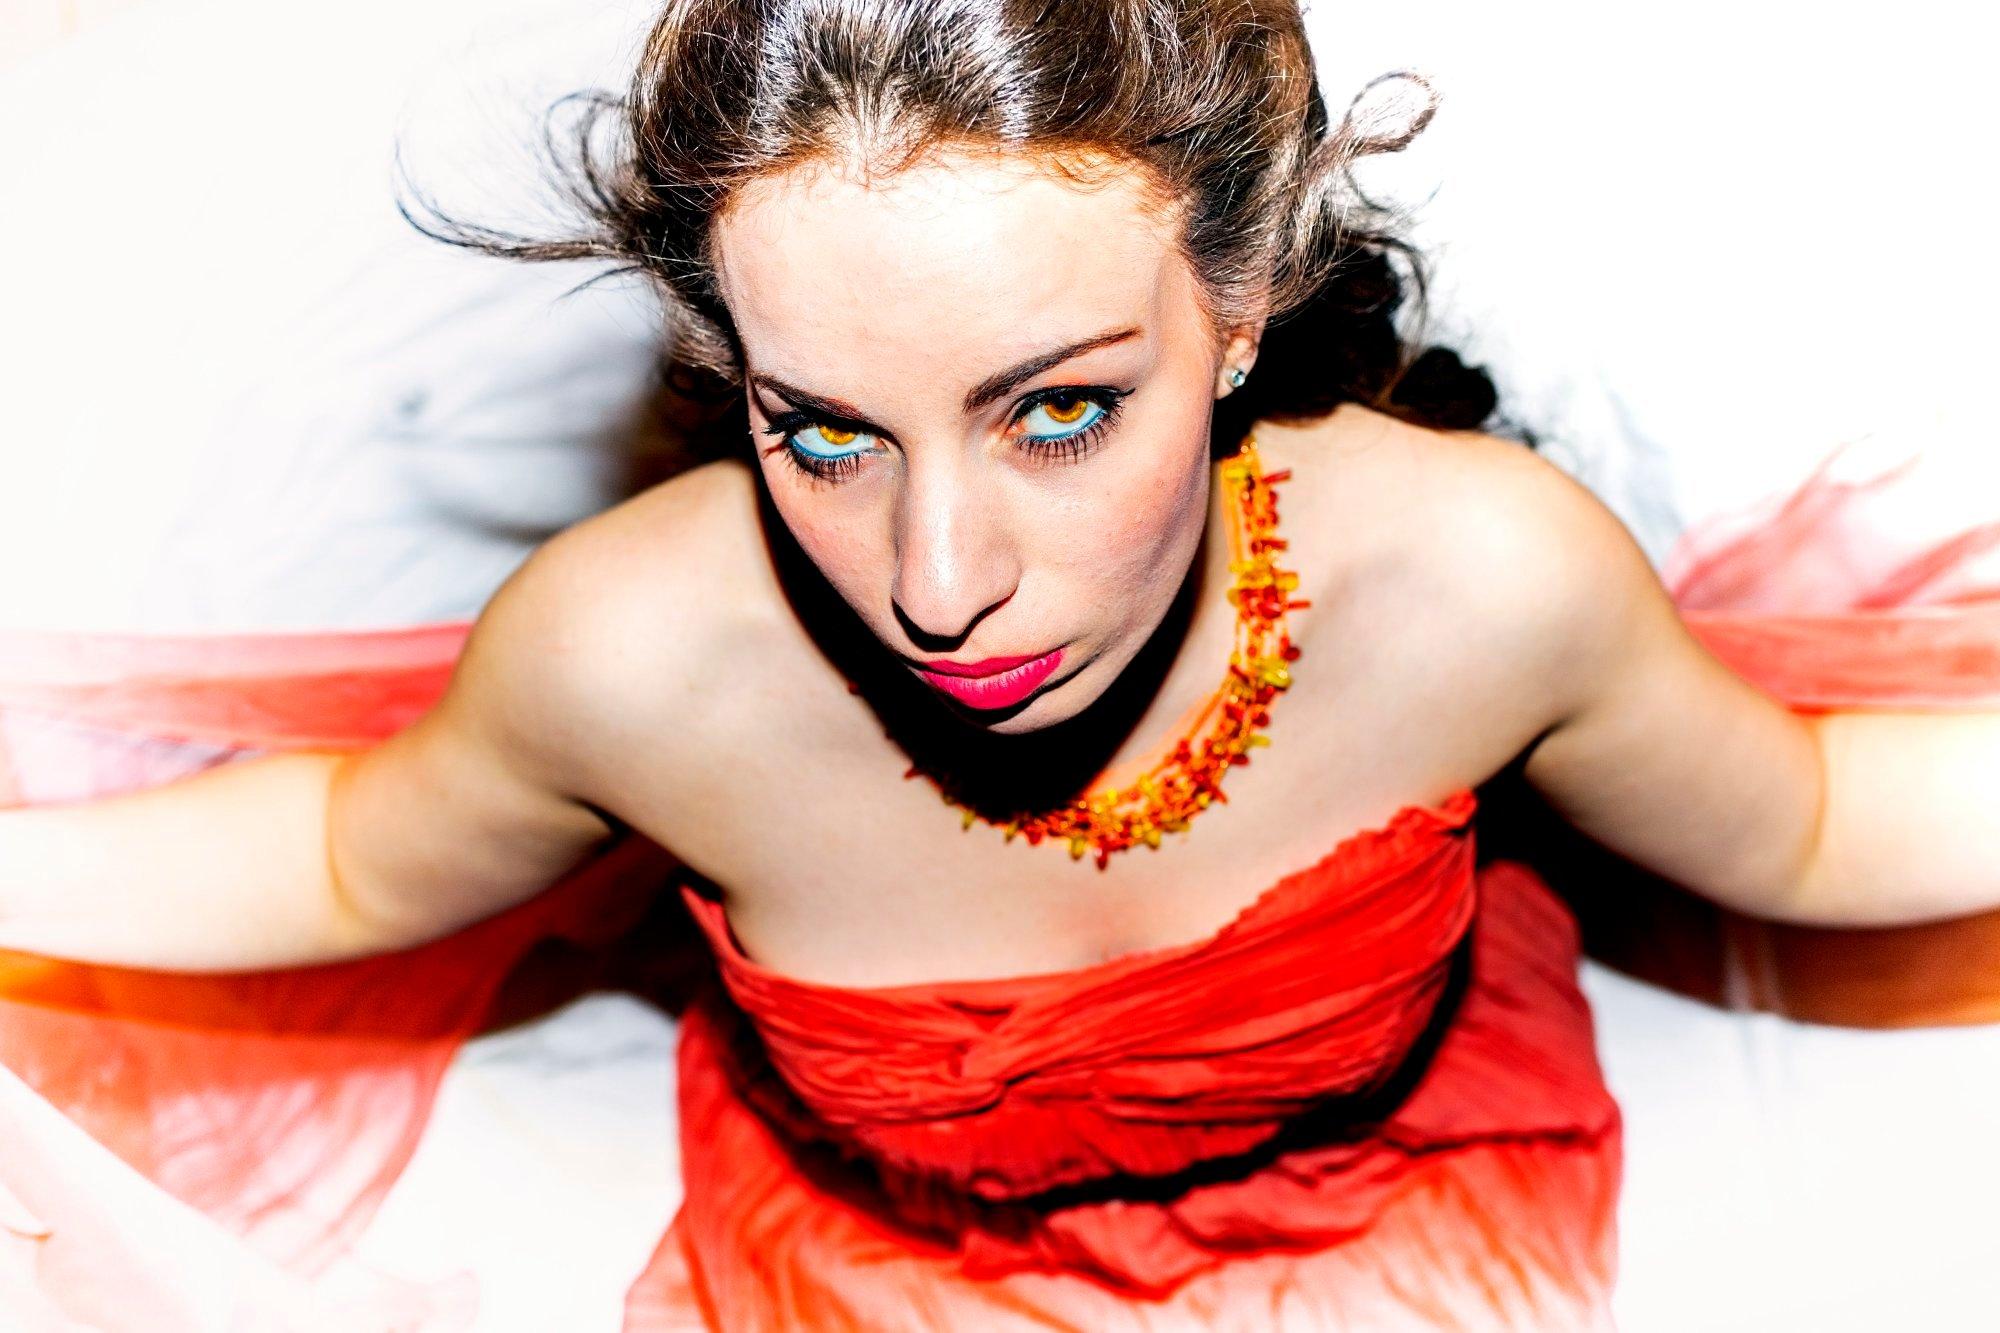 jeune-femme-rouge-seance-shooting-photo-photographe-professionnel